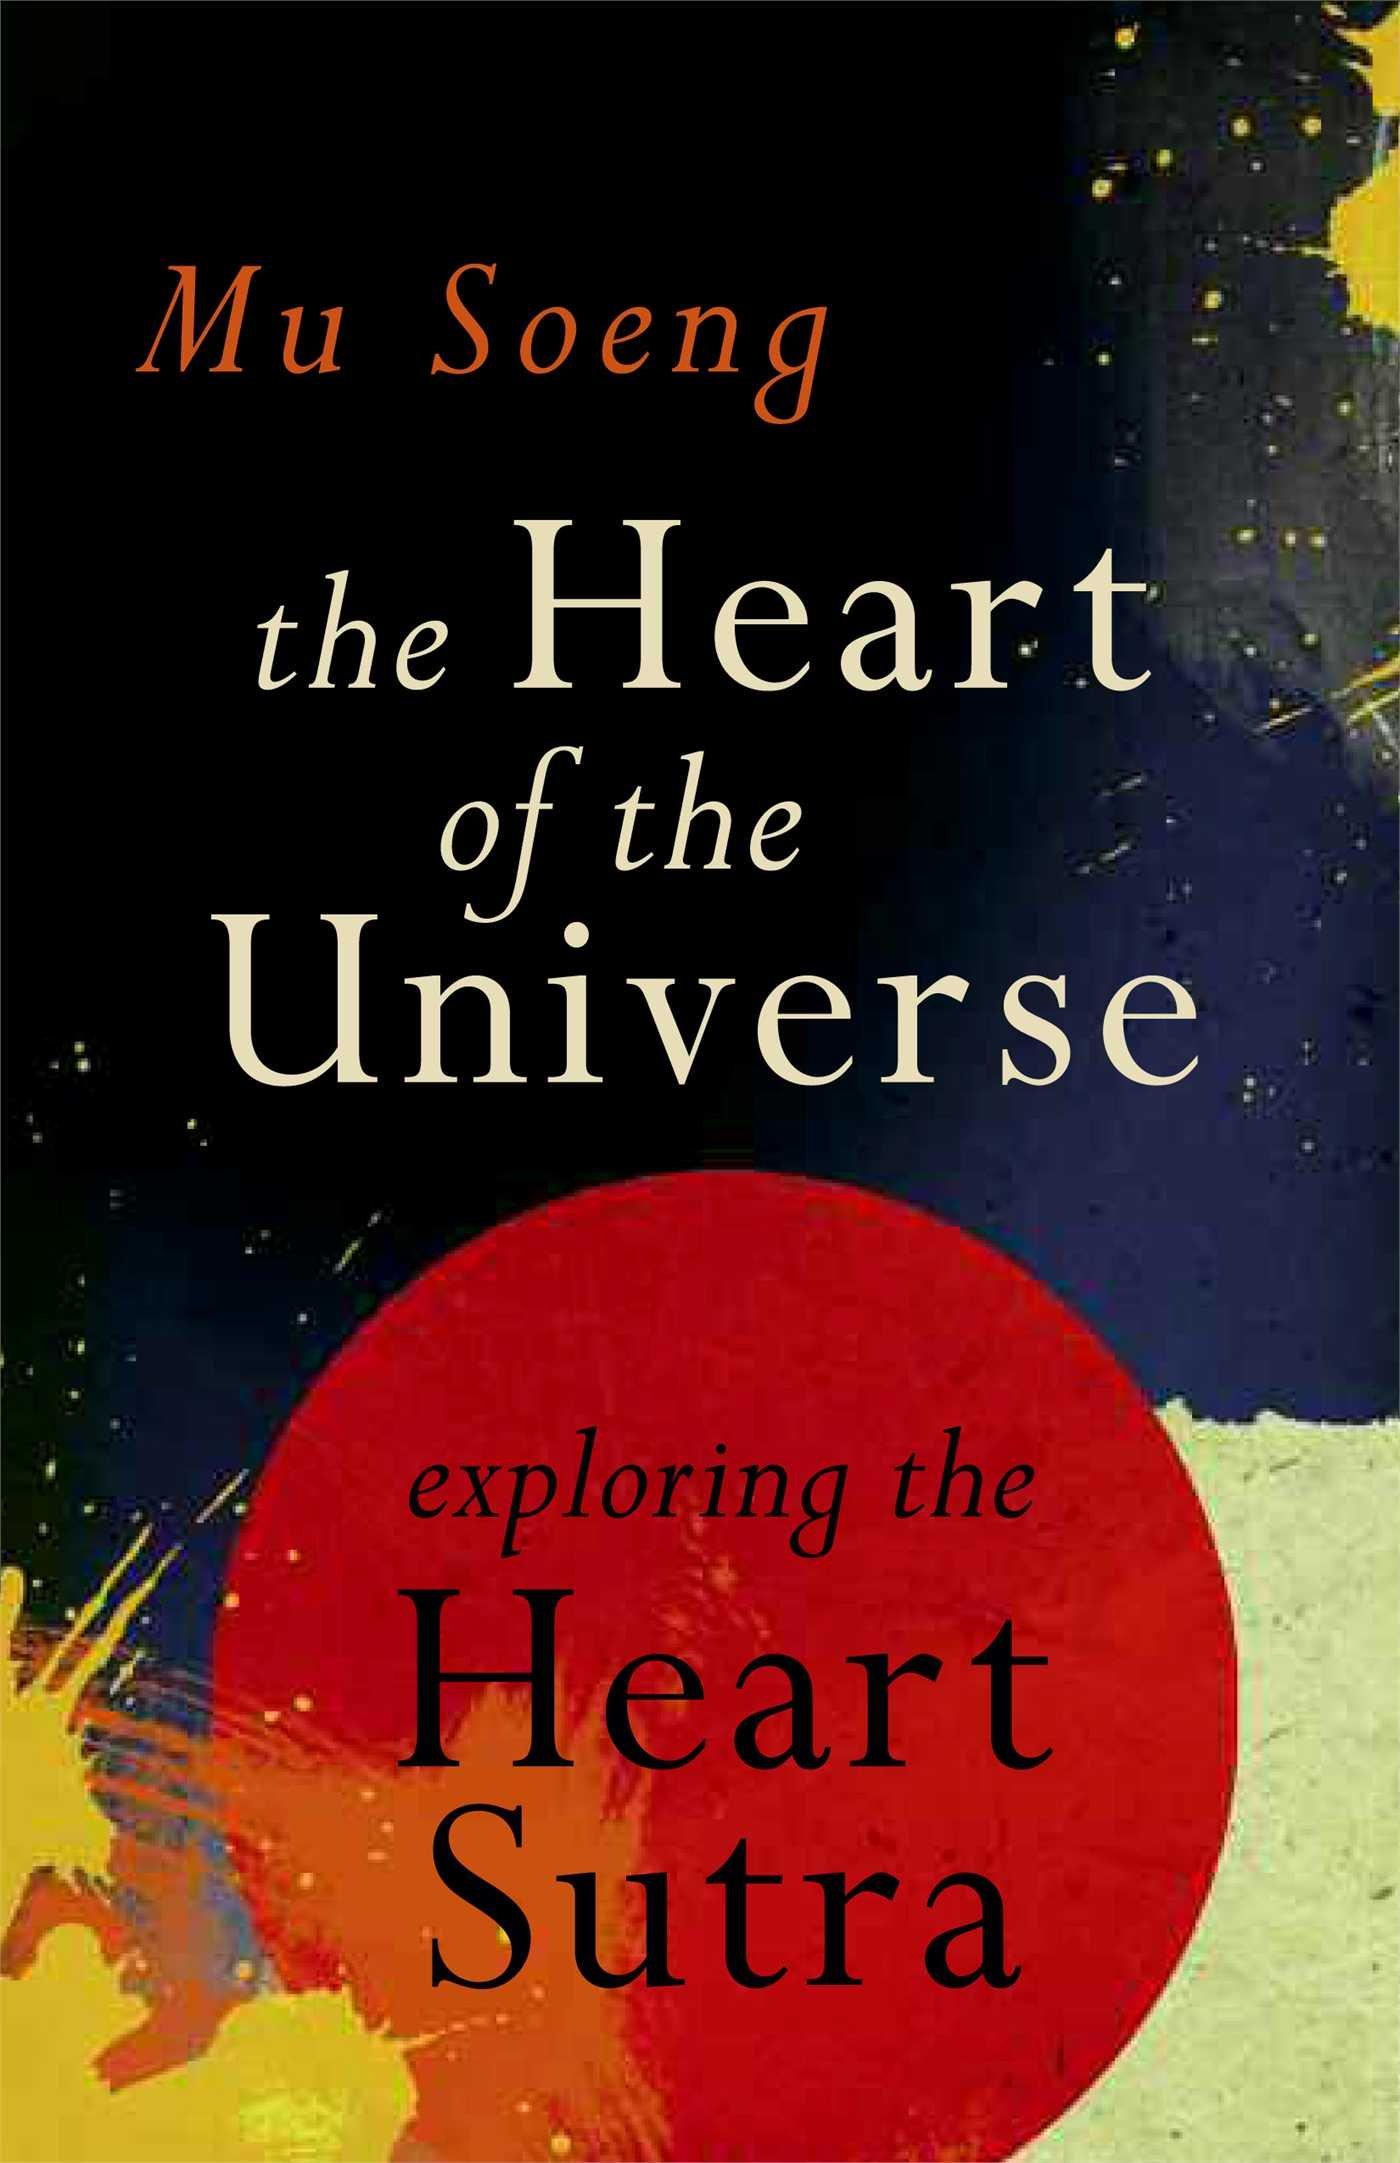 Amazon.com: The Heart of the Universe: Exploring the Heart Sutra  (9780861715749): Mu Soeng: Books